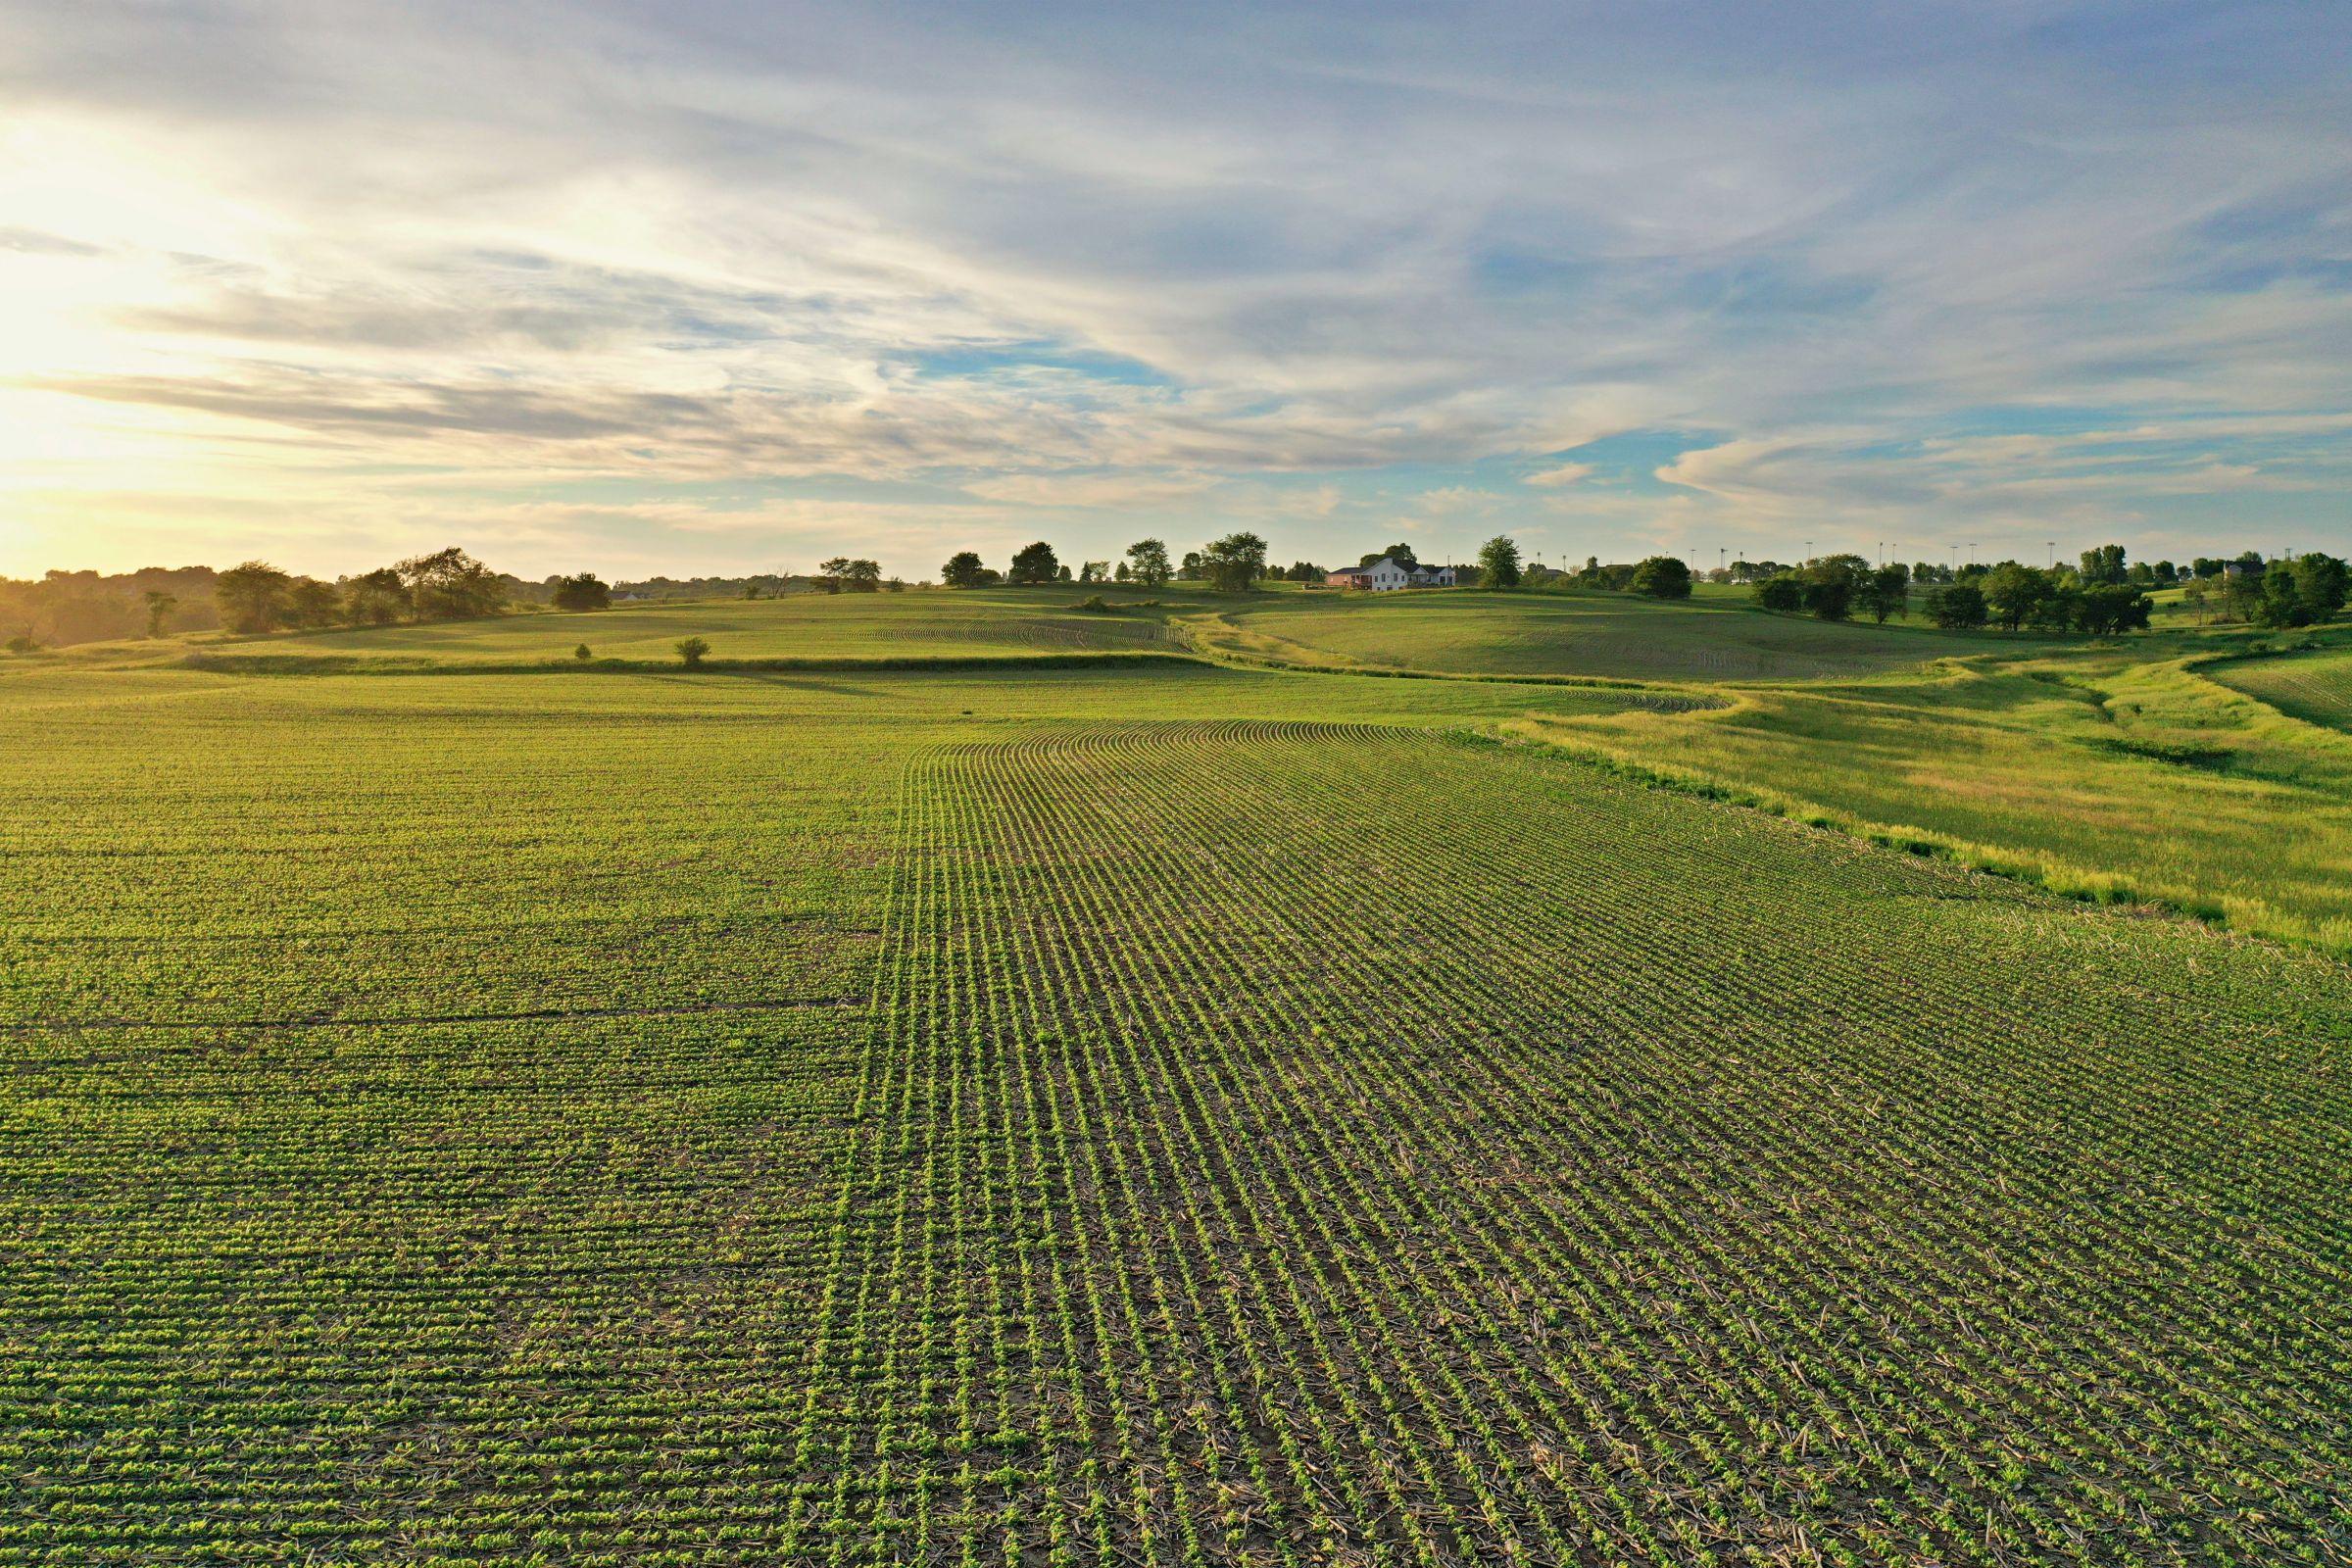 land-warren-county-iowa-20-acres-listing-number-15425-3-2021-03-25-193608.JPG